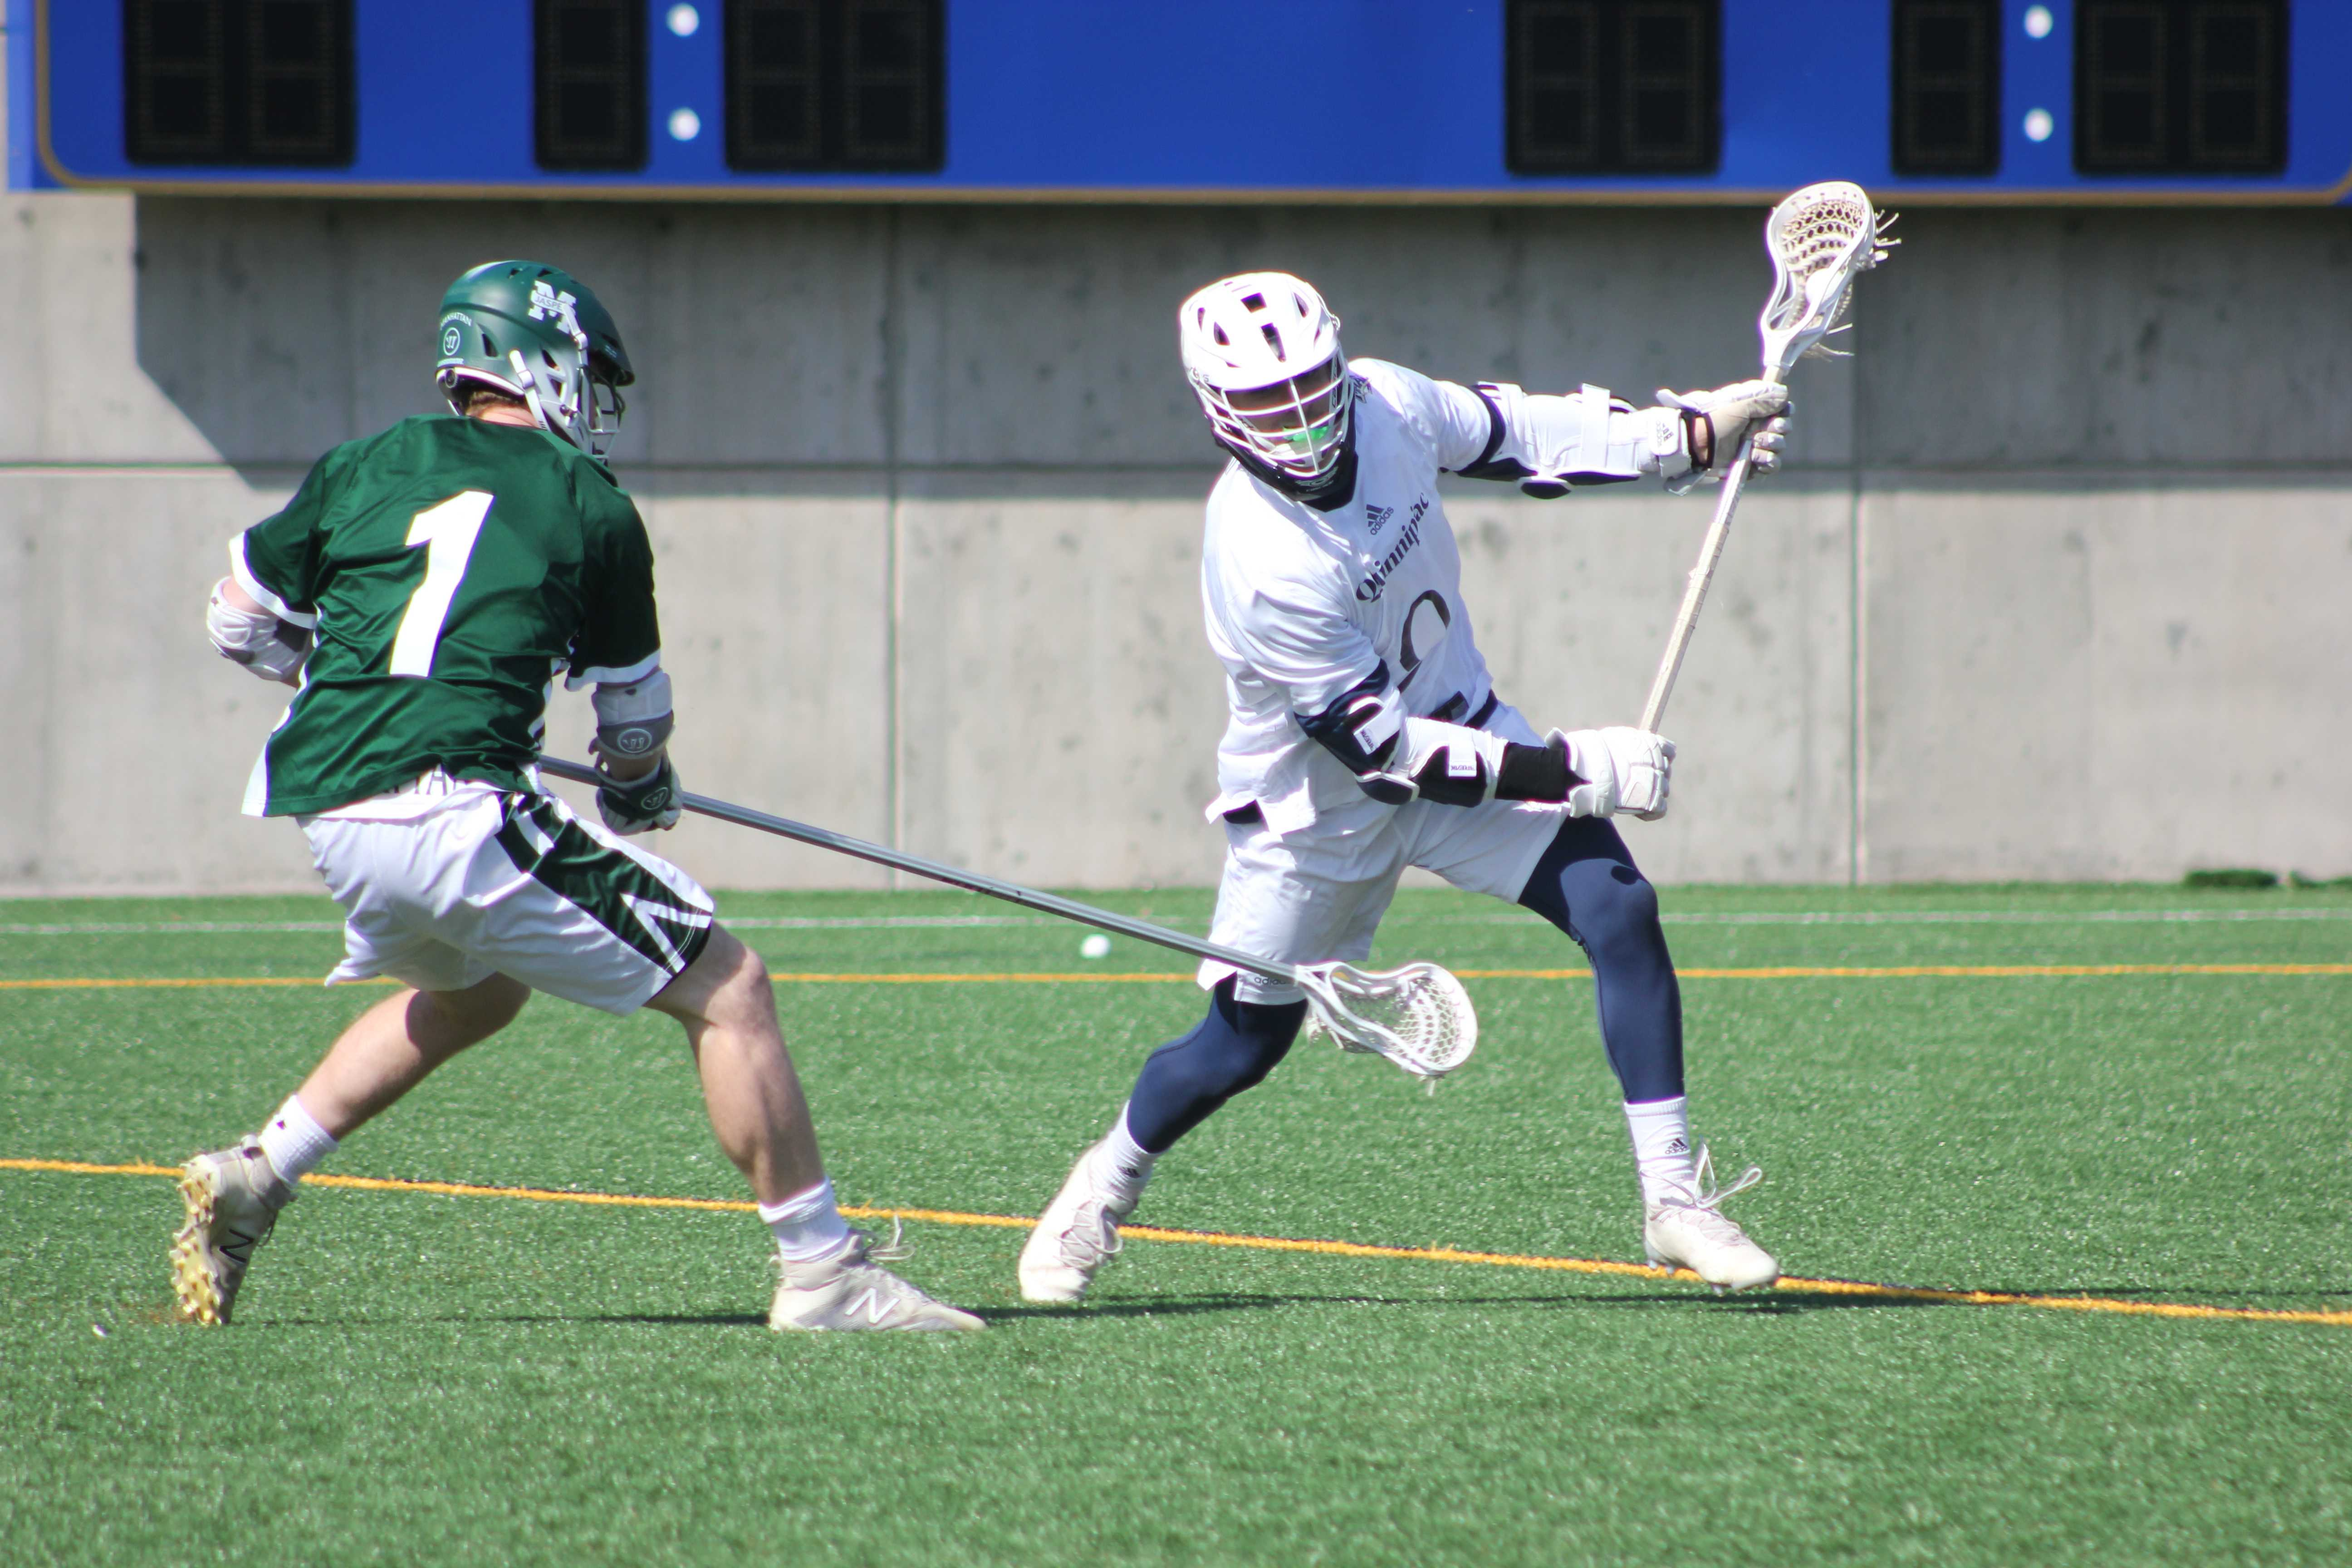 Quinnipiac men's lacrosse defeats Manhattan 9-5, stays unbeaten in the MAAC